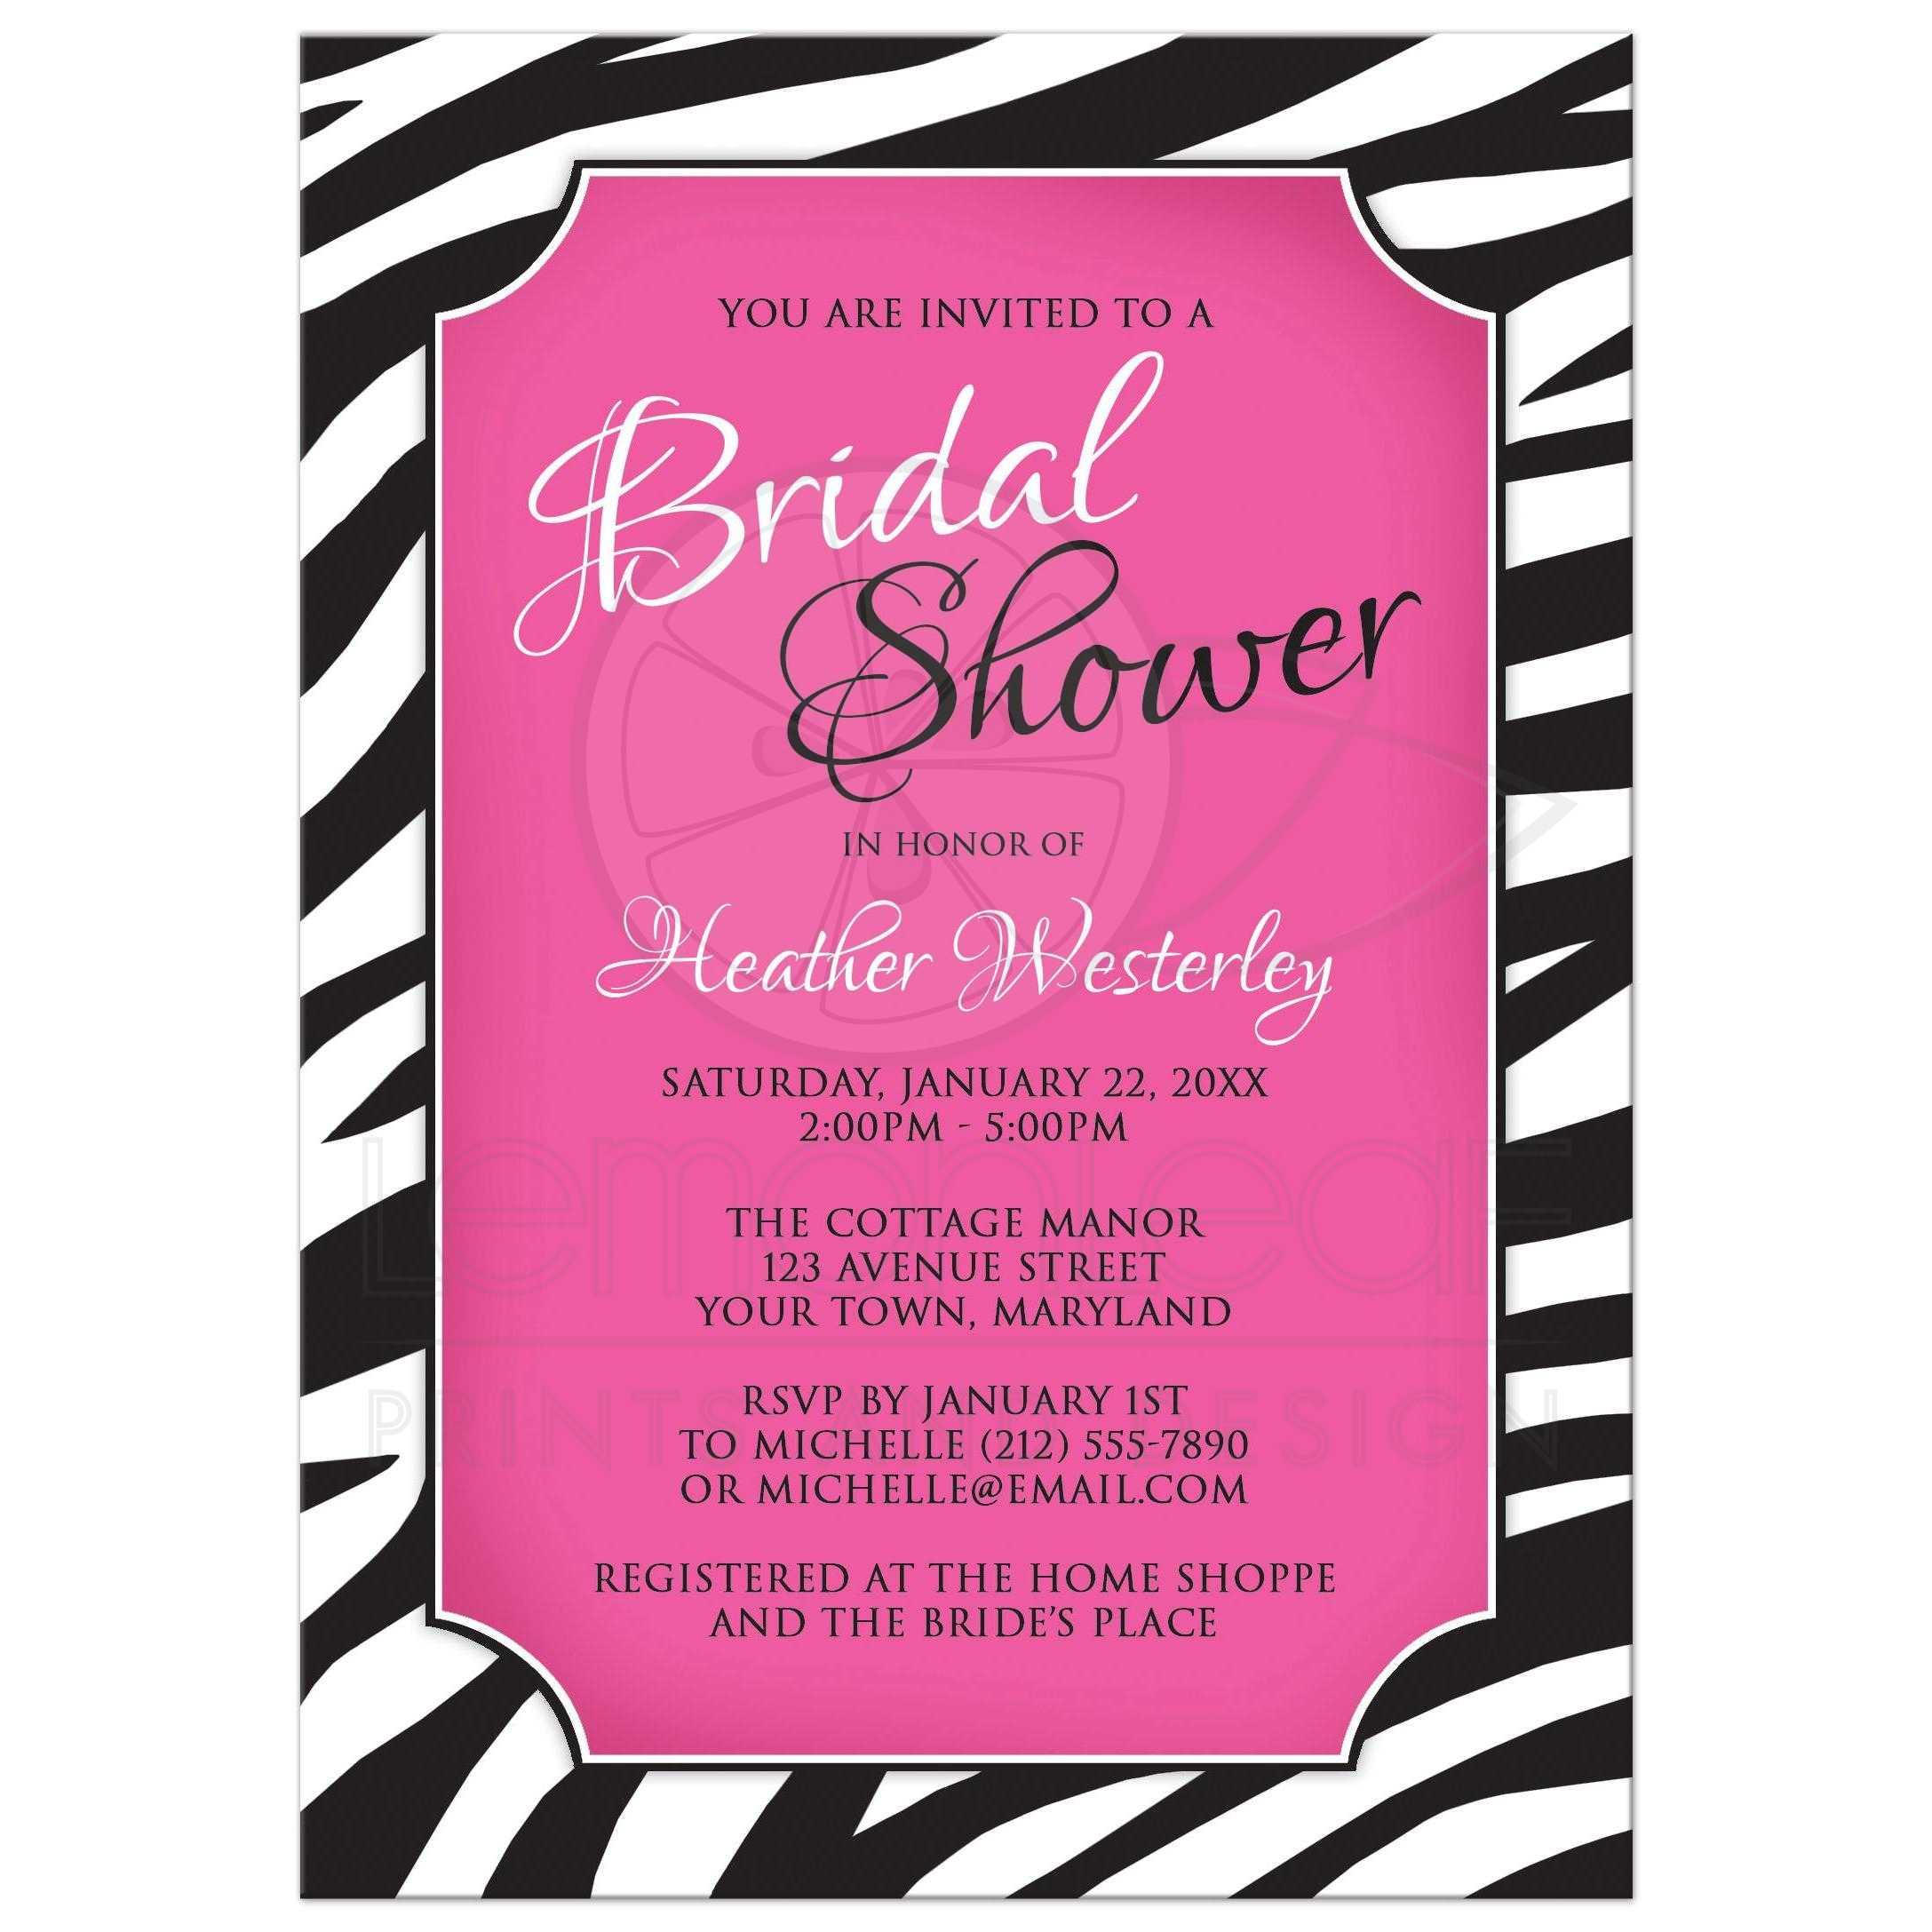 Bridal shower invitations chic zebra print pink filmwisefo